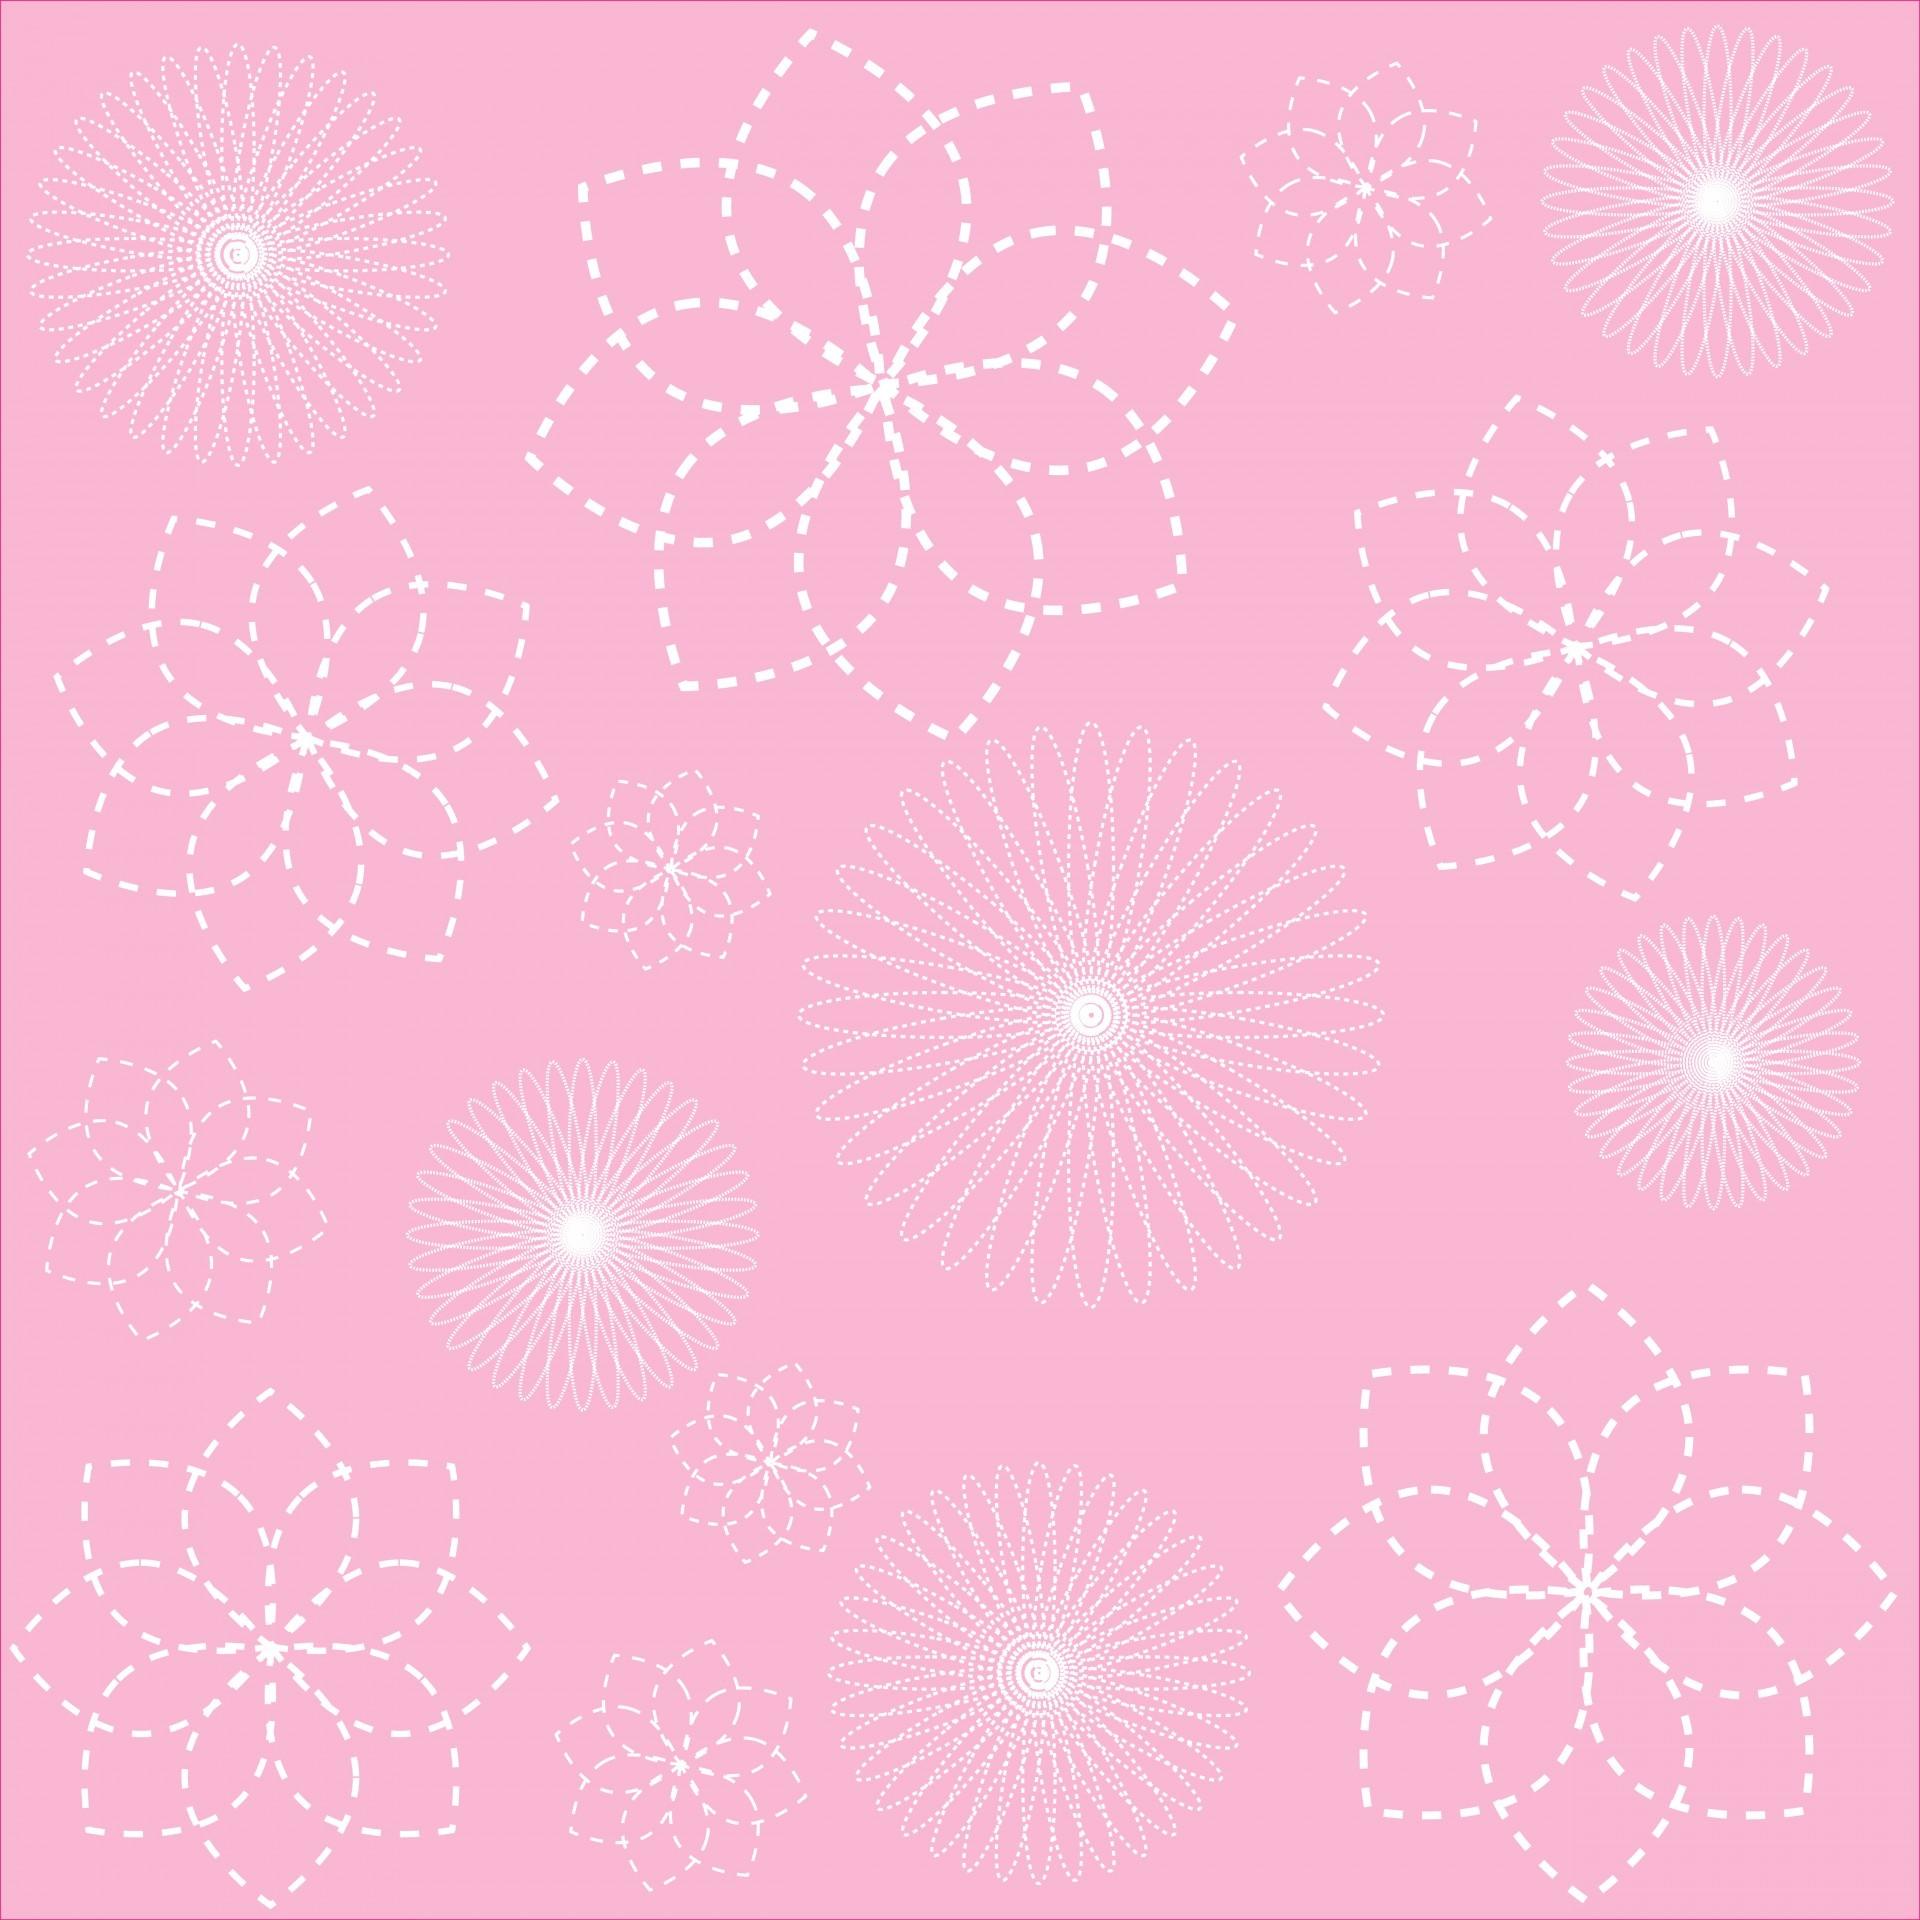 Pink Swirl Wallpaper 183 ① Wallpapertag